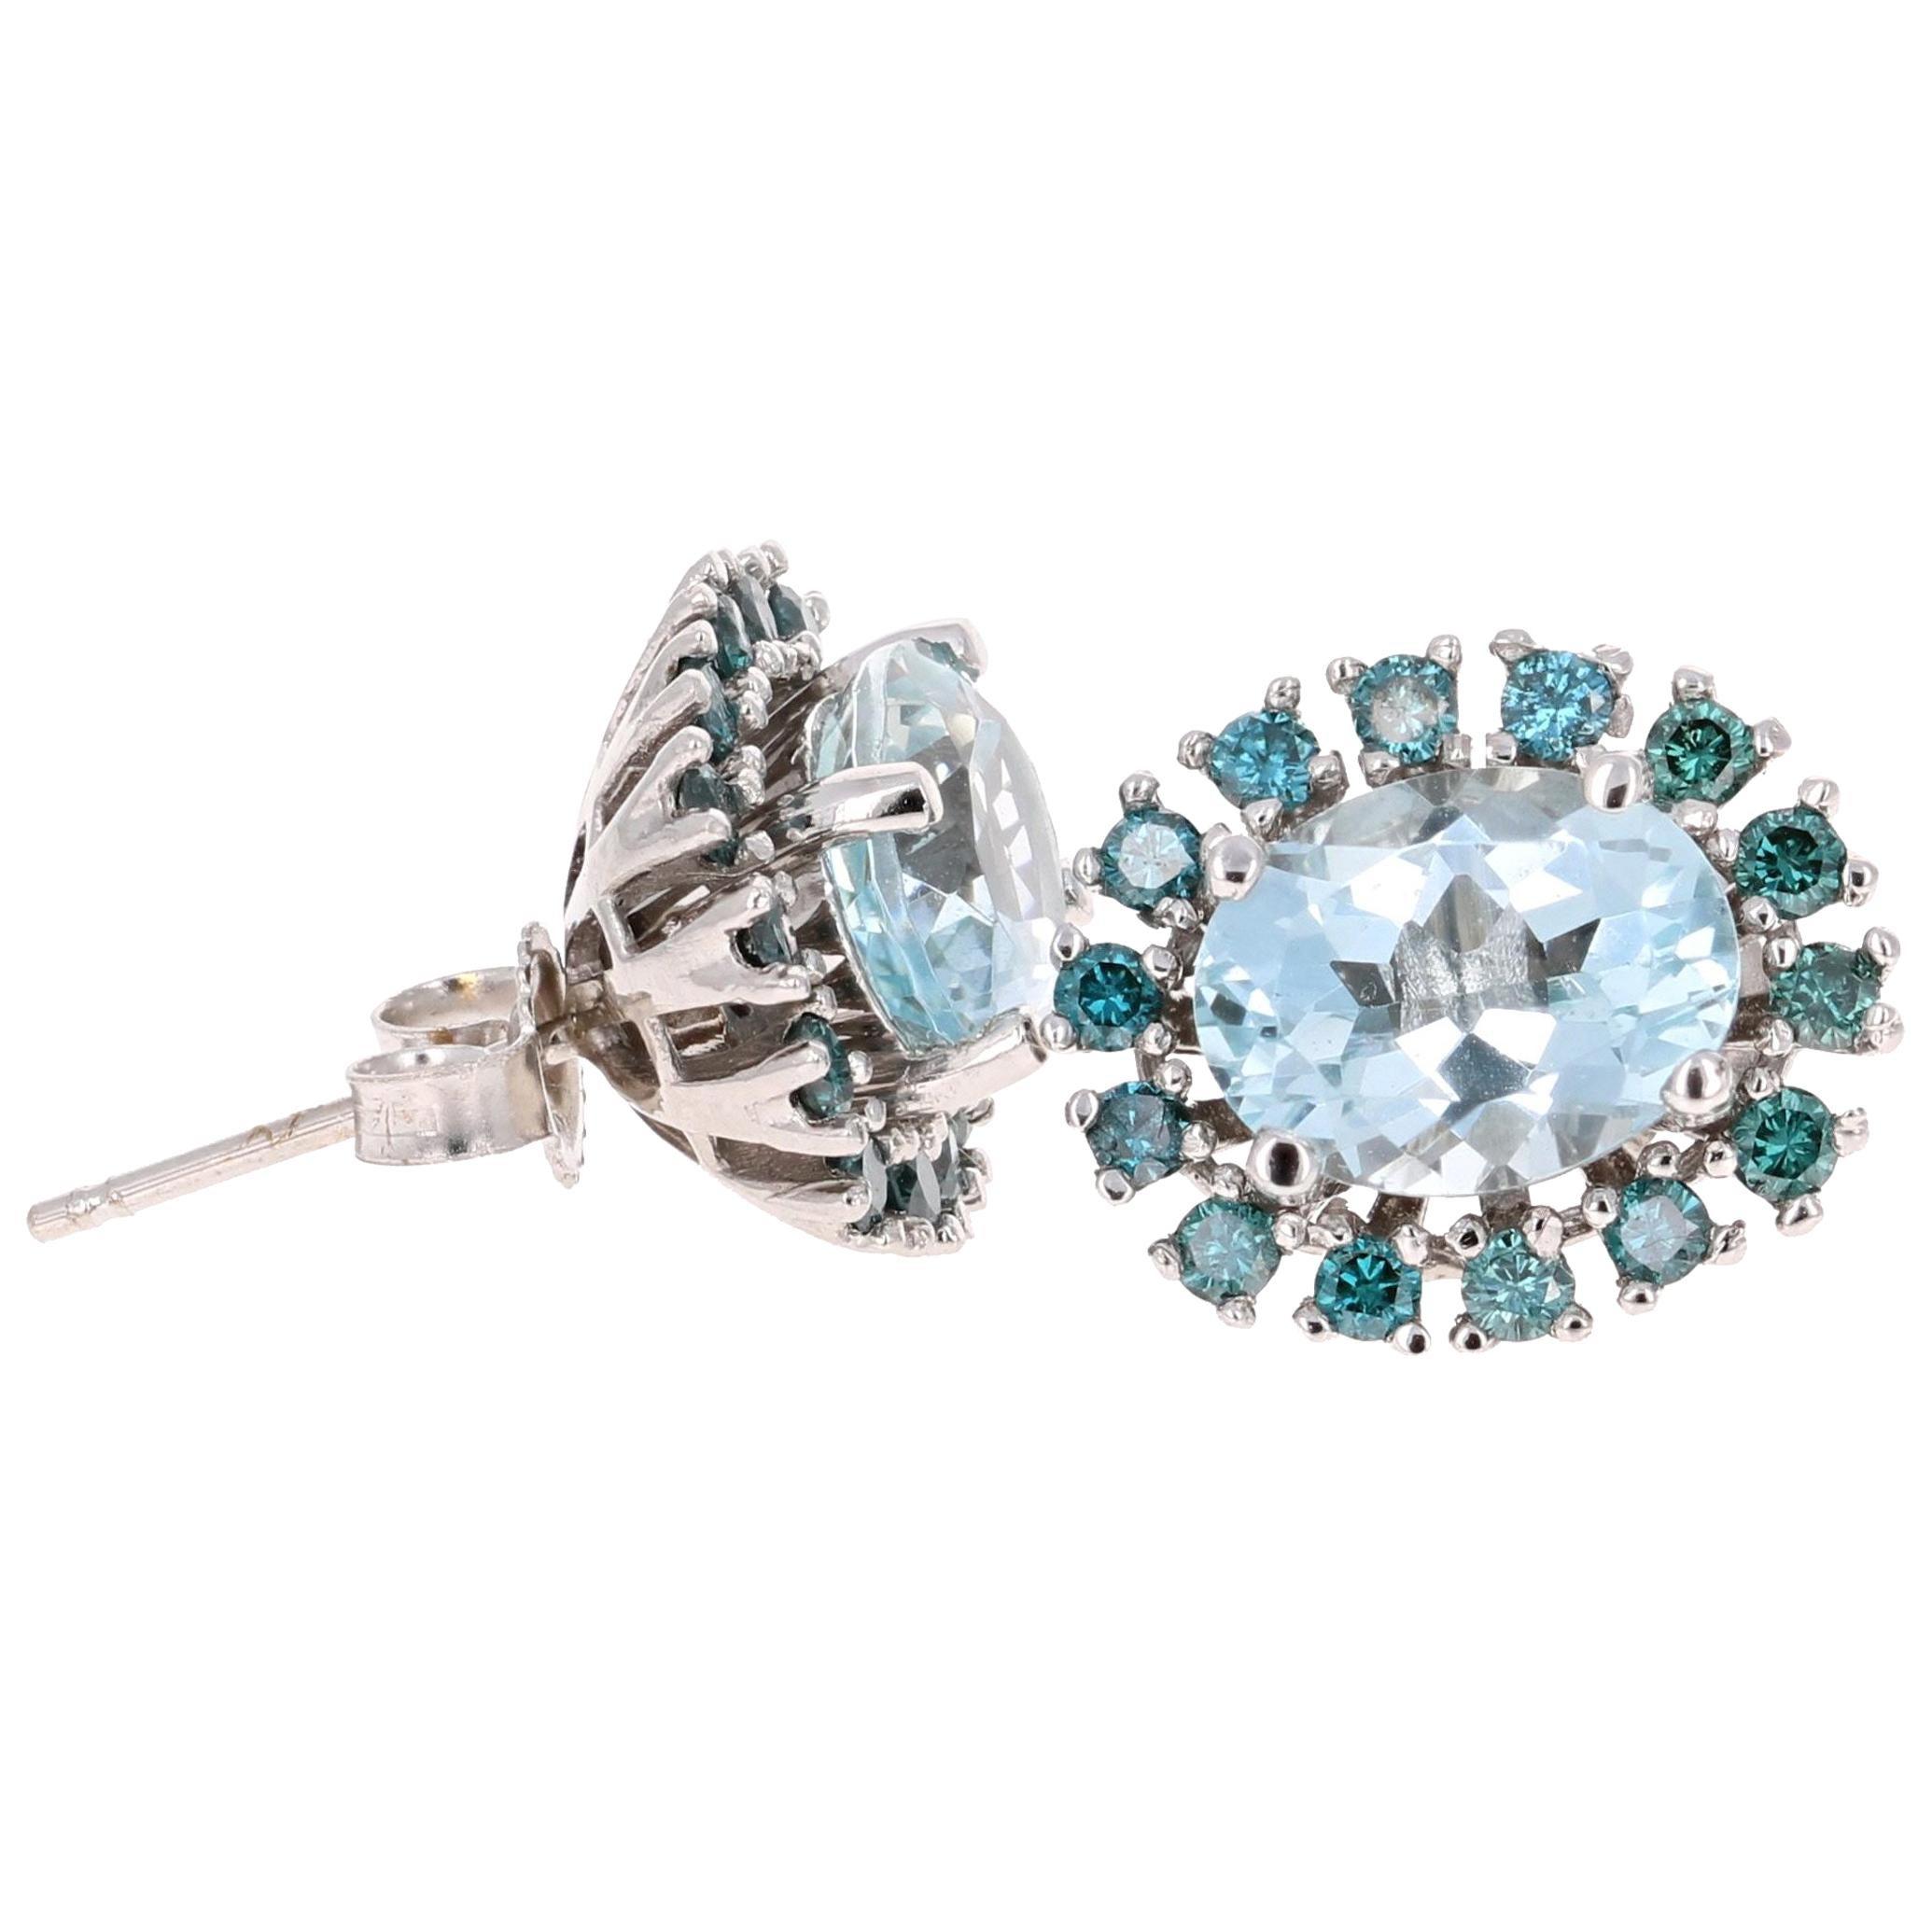 1cb8a042426 4.19 Carat Aquamarine and Blue Diamond White Gold Stud Earrings at 1stdibs